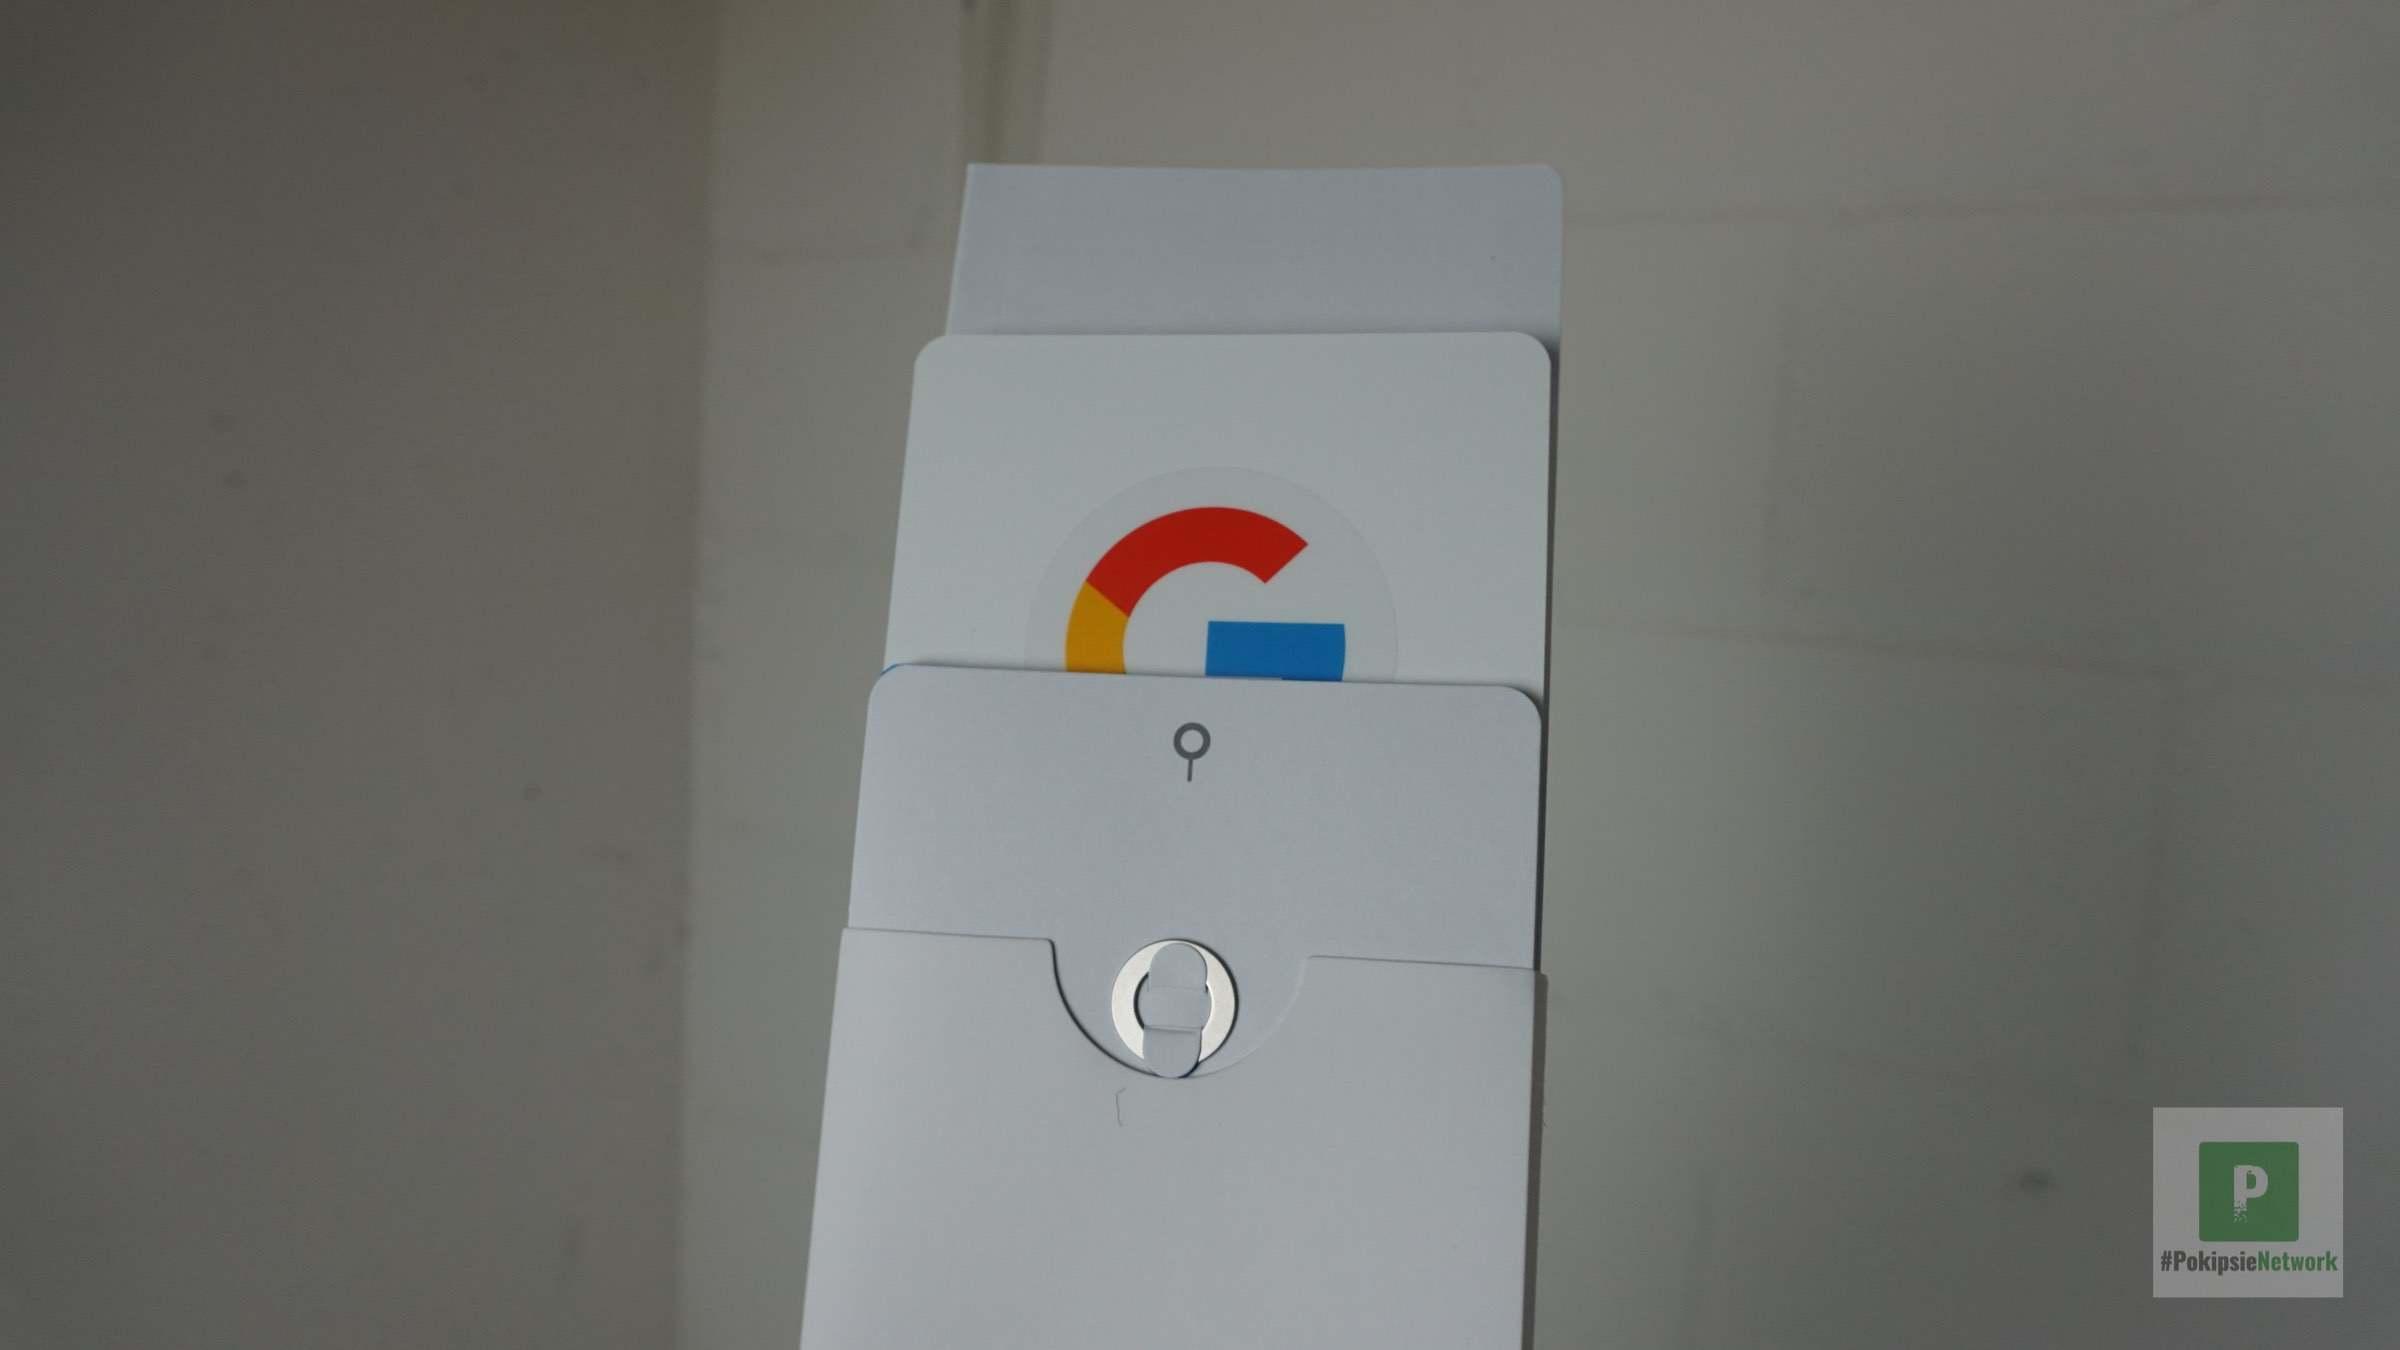 Papierzeugs und SIM-Karten-Tool